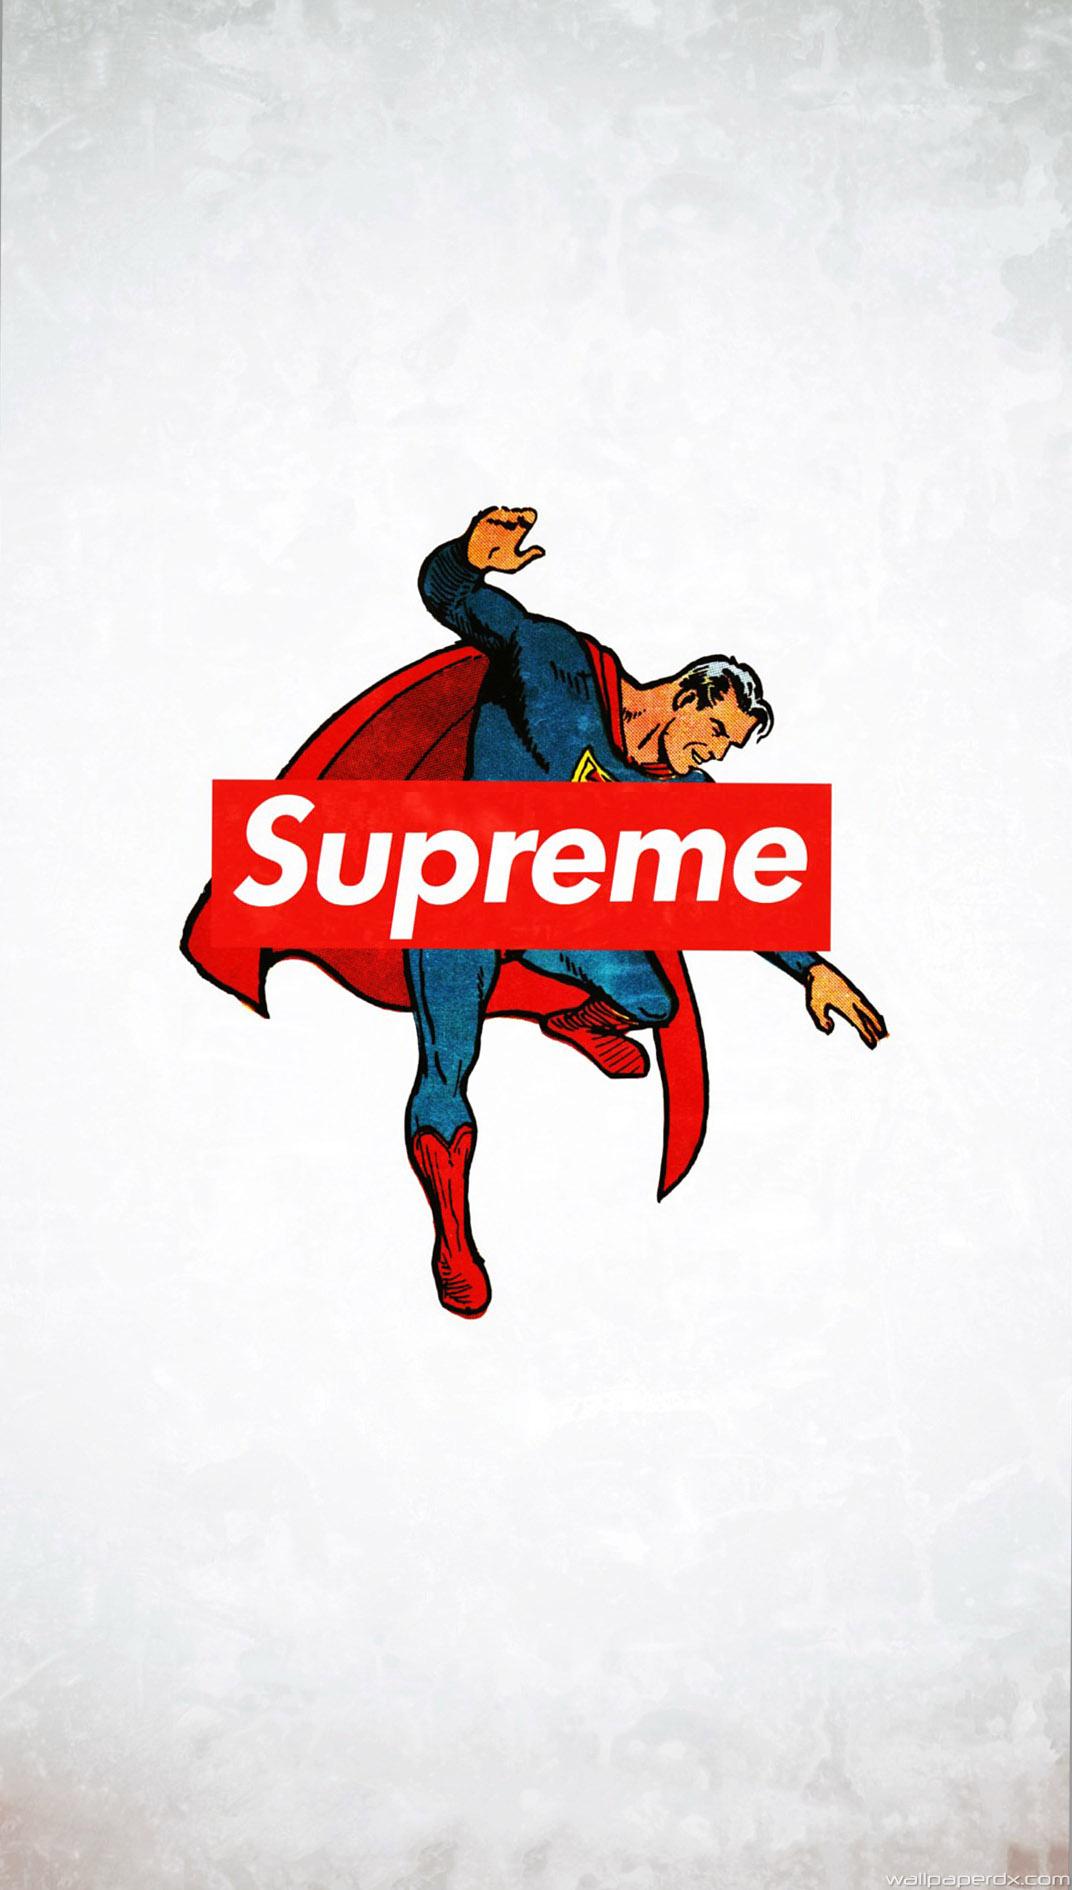 96] Supreme iPhone Wallpaper on WallpaperSafari 1072x1890